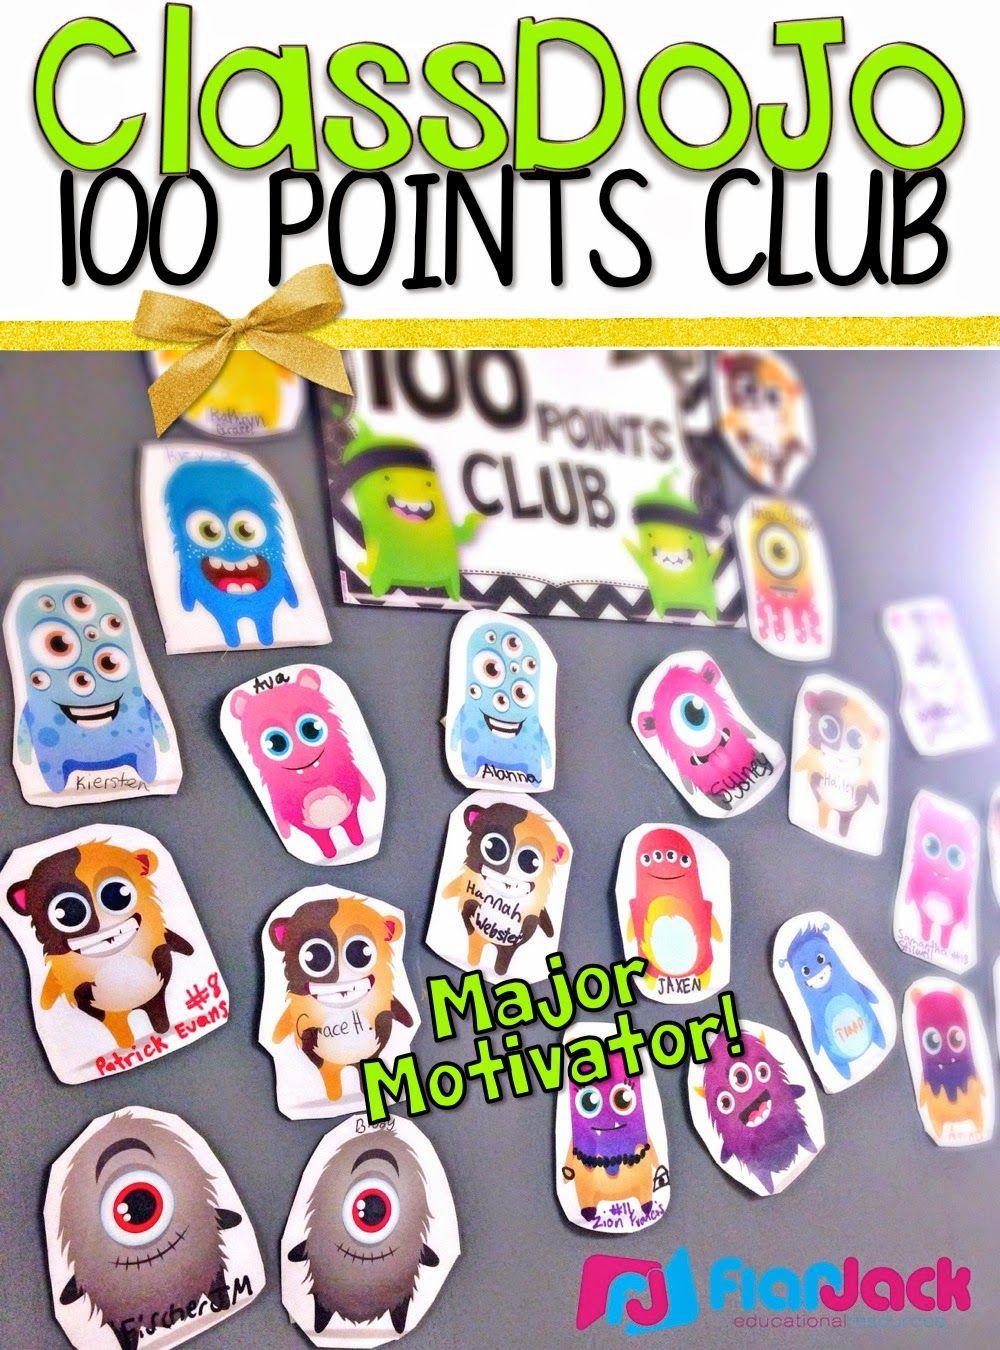 ClassDoJo 100 Points Club General Teaching Ideas